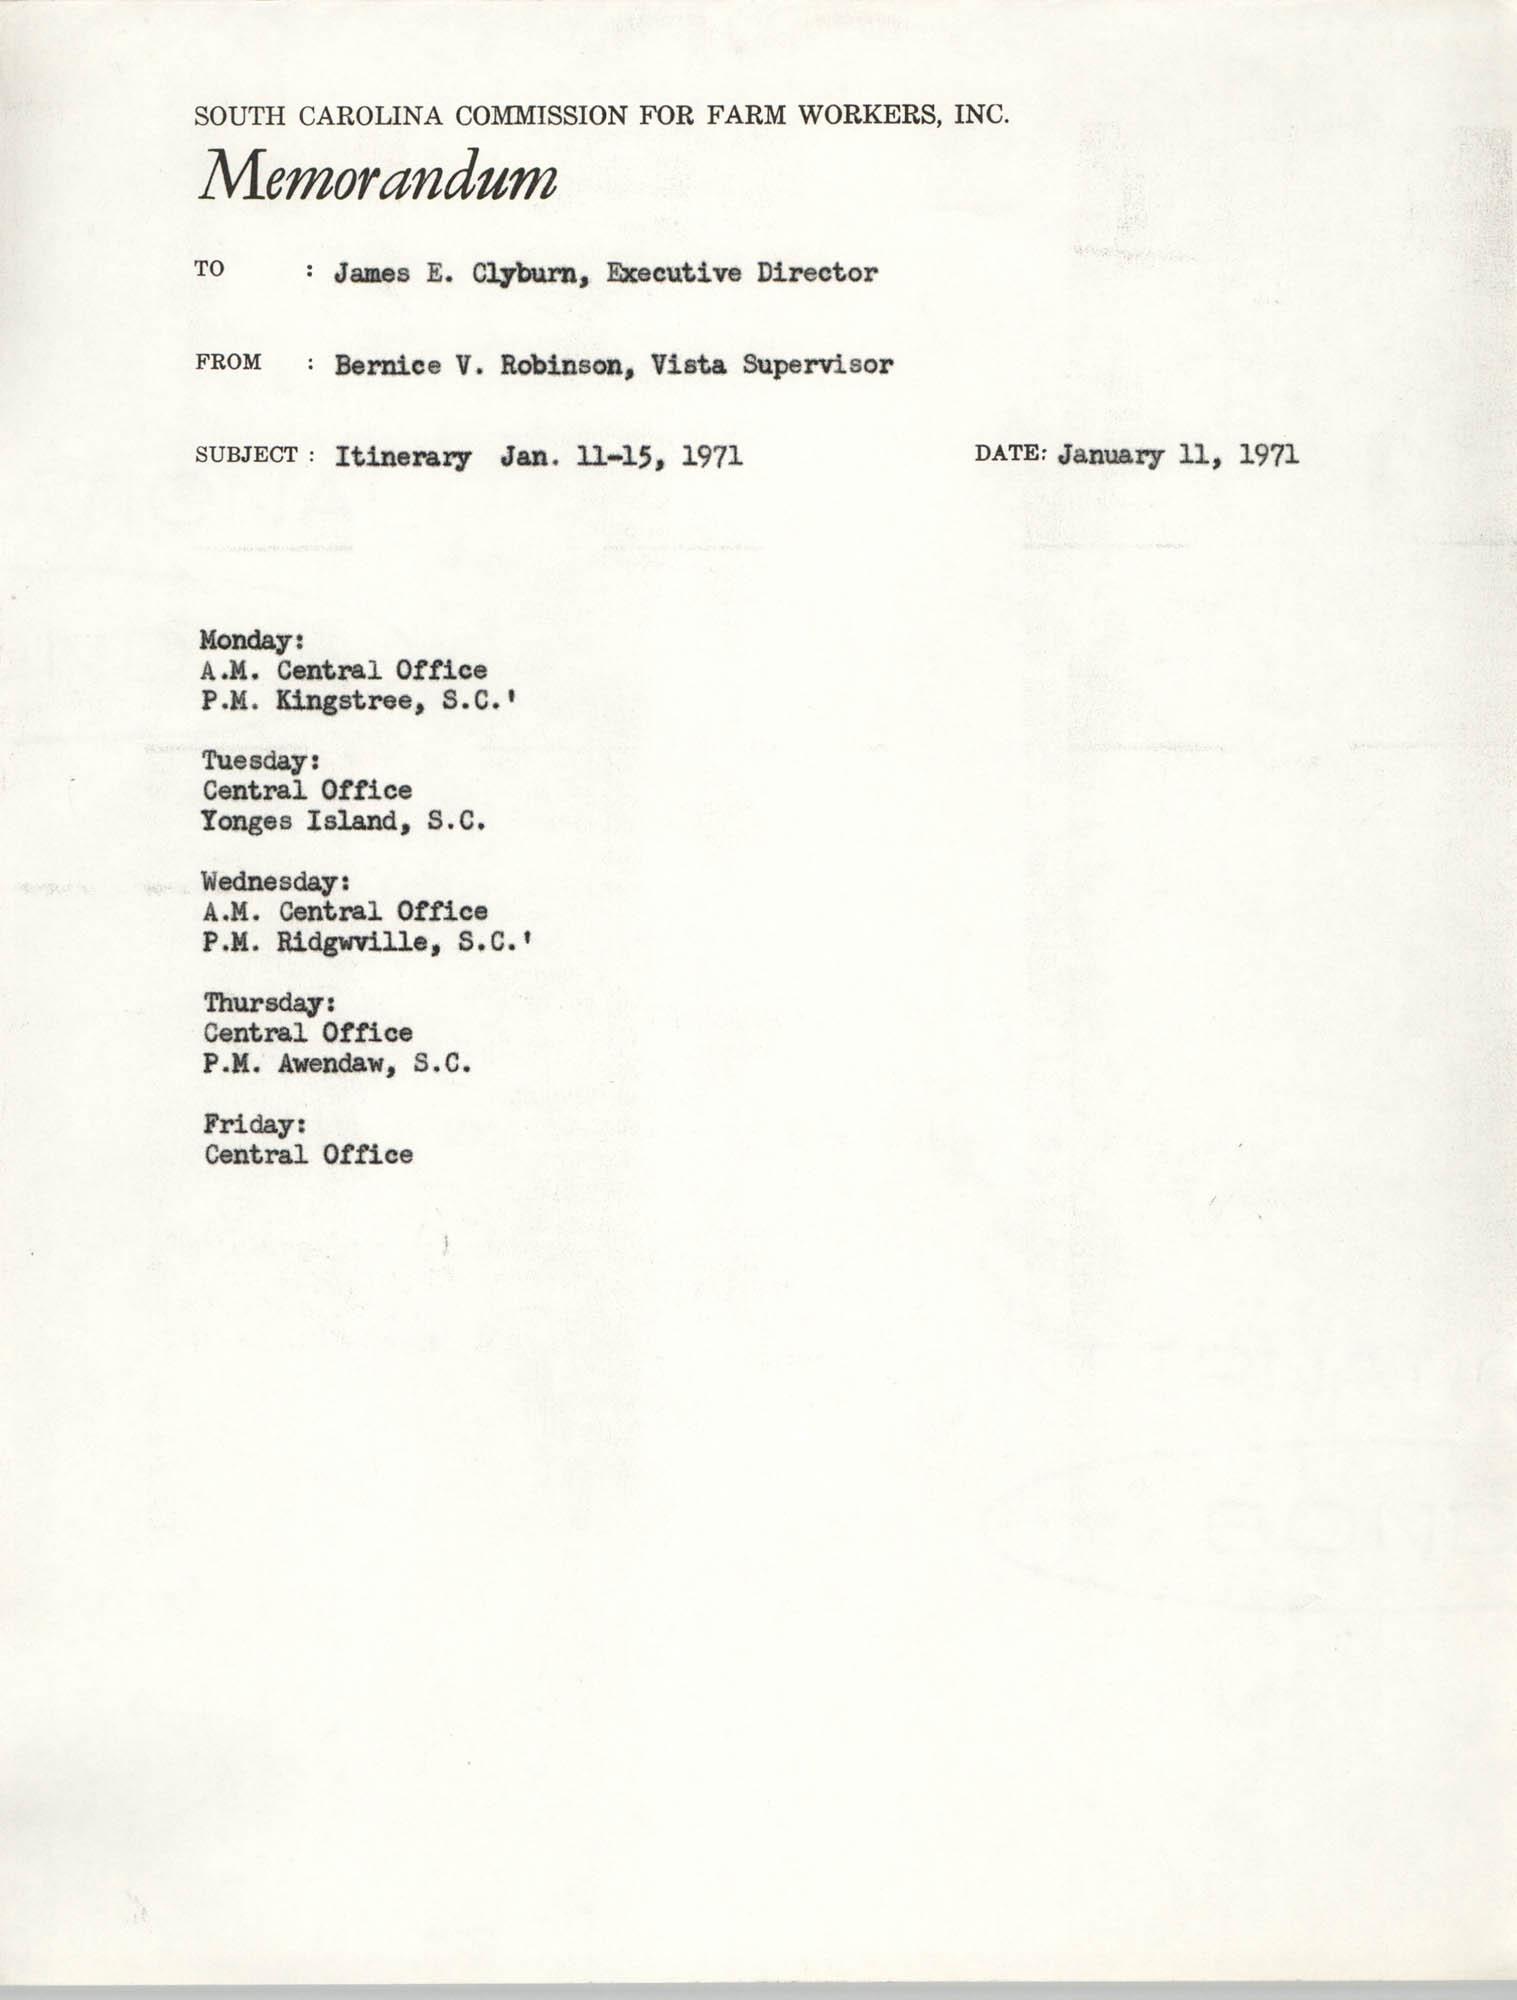 Memorandum from Bernice V. Robinson to James E. Clyburn, January 11, 1971